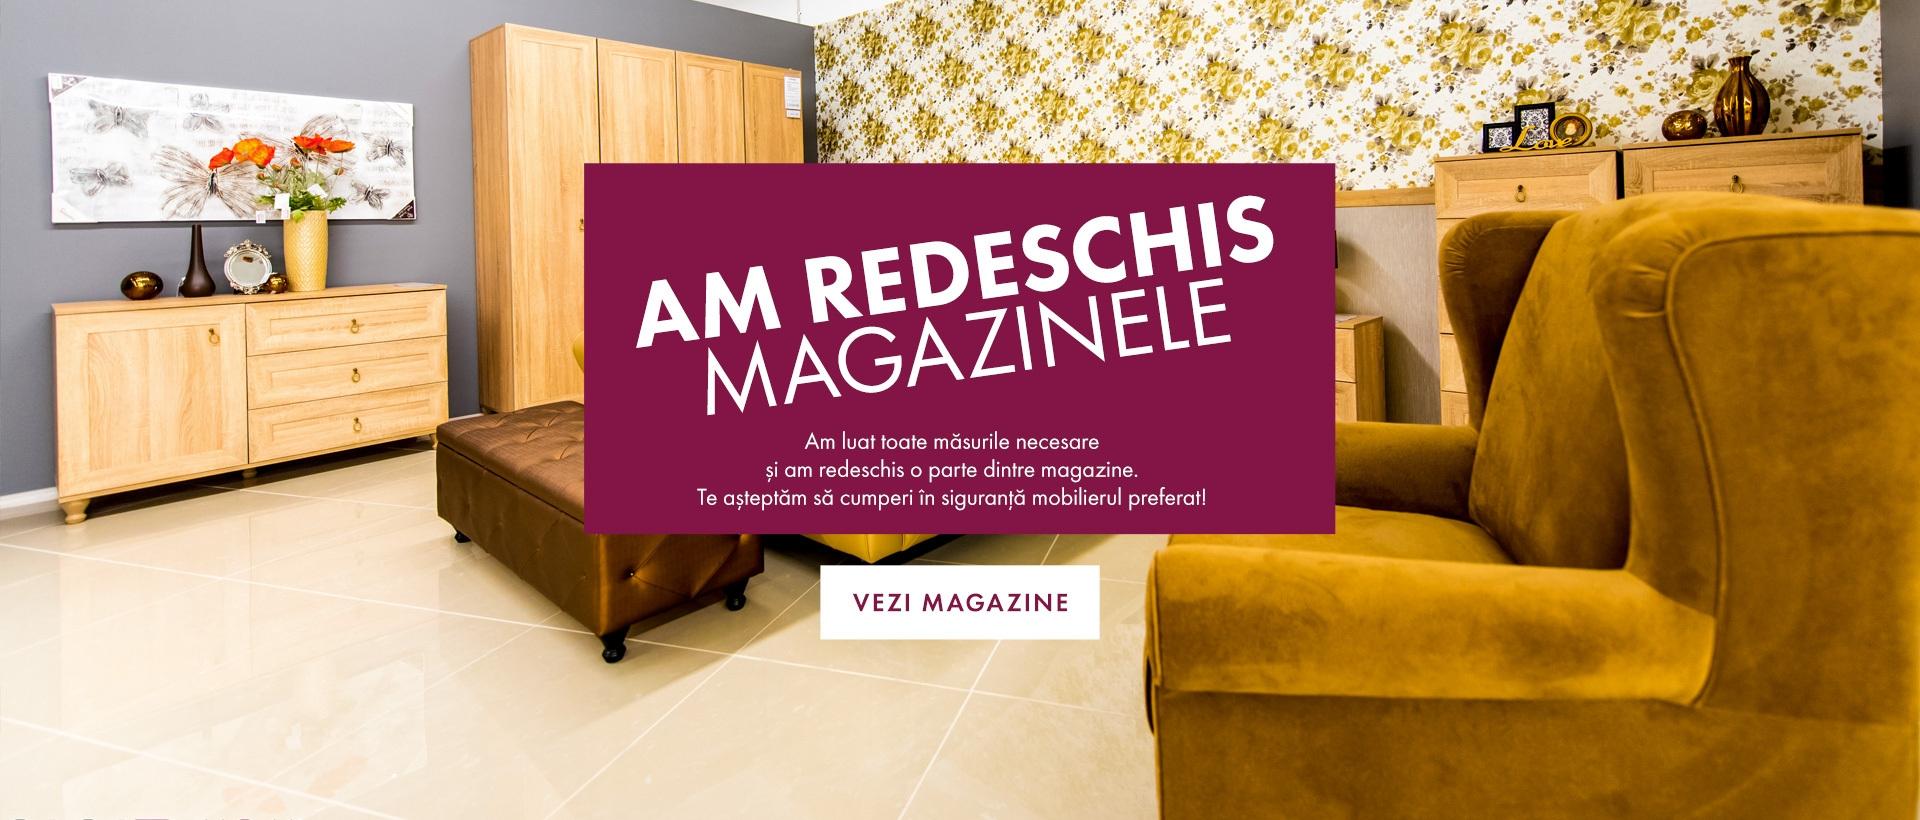 Magazine deschise